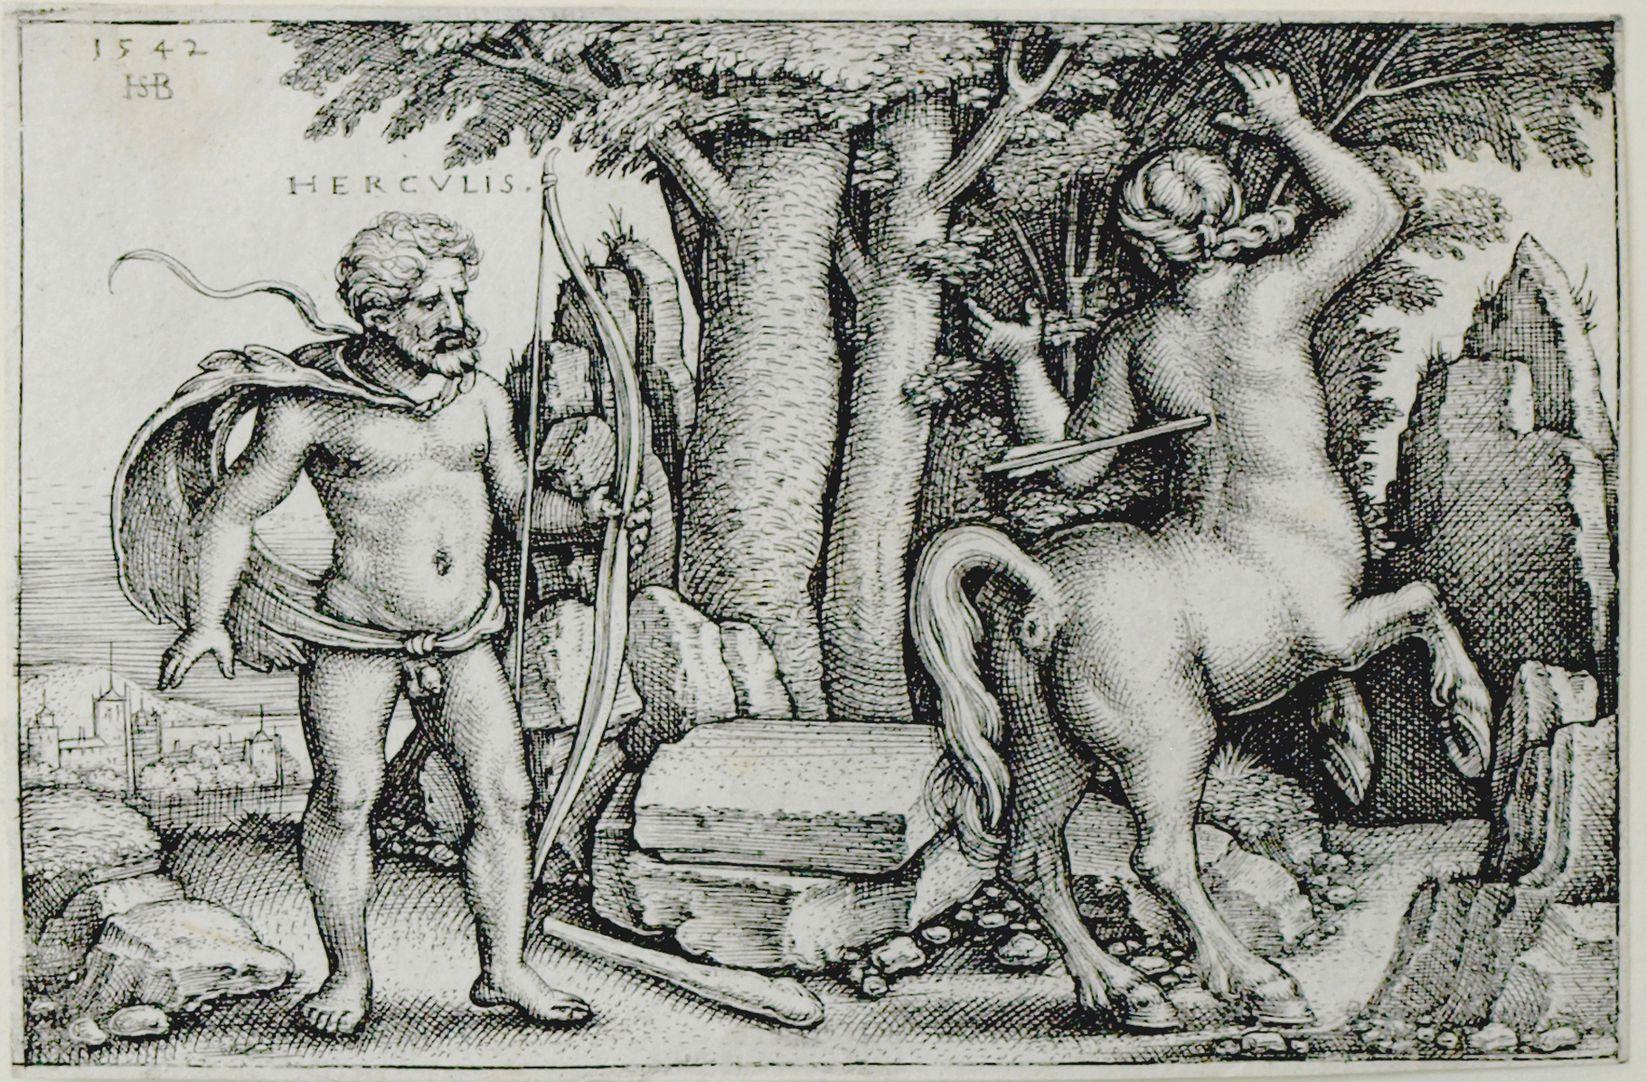 Die Taten des Hercules Hercules tötet Nessus 1542, 50 x 78 mm